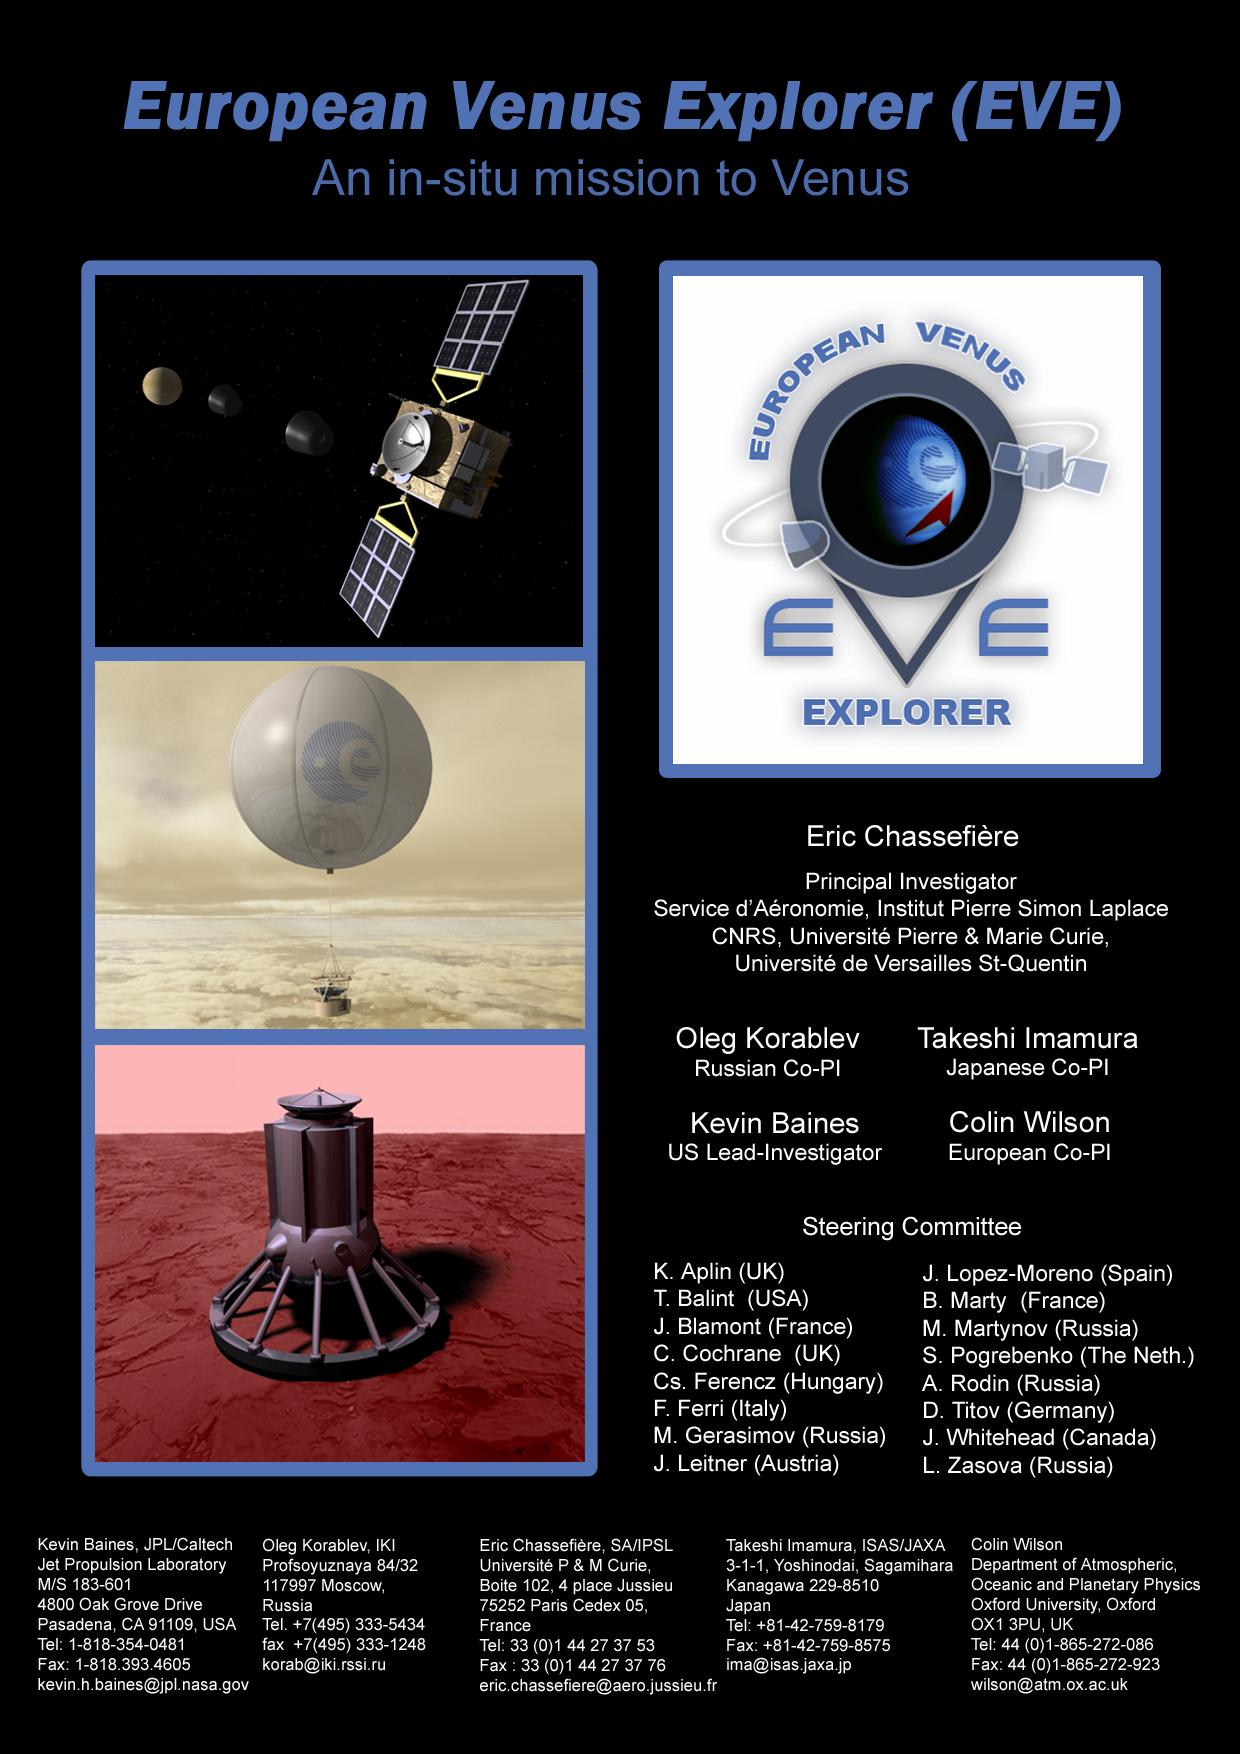 EVE_ProposalCover_rev2.jpg